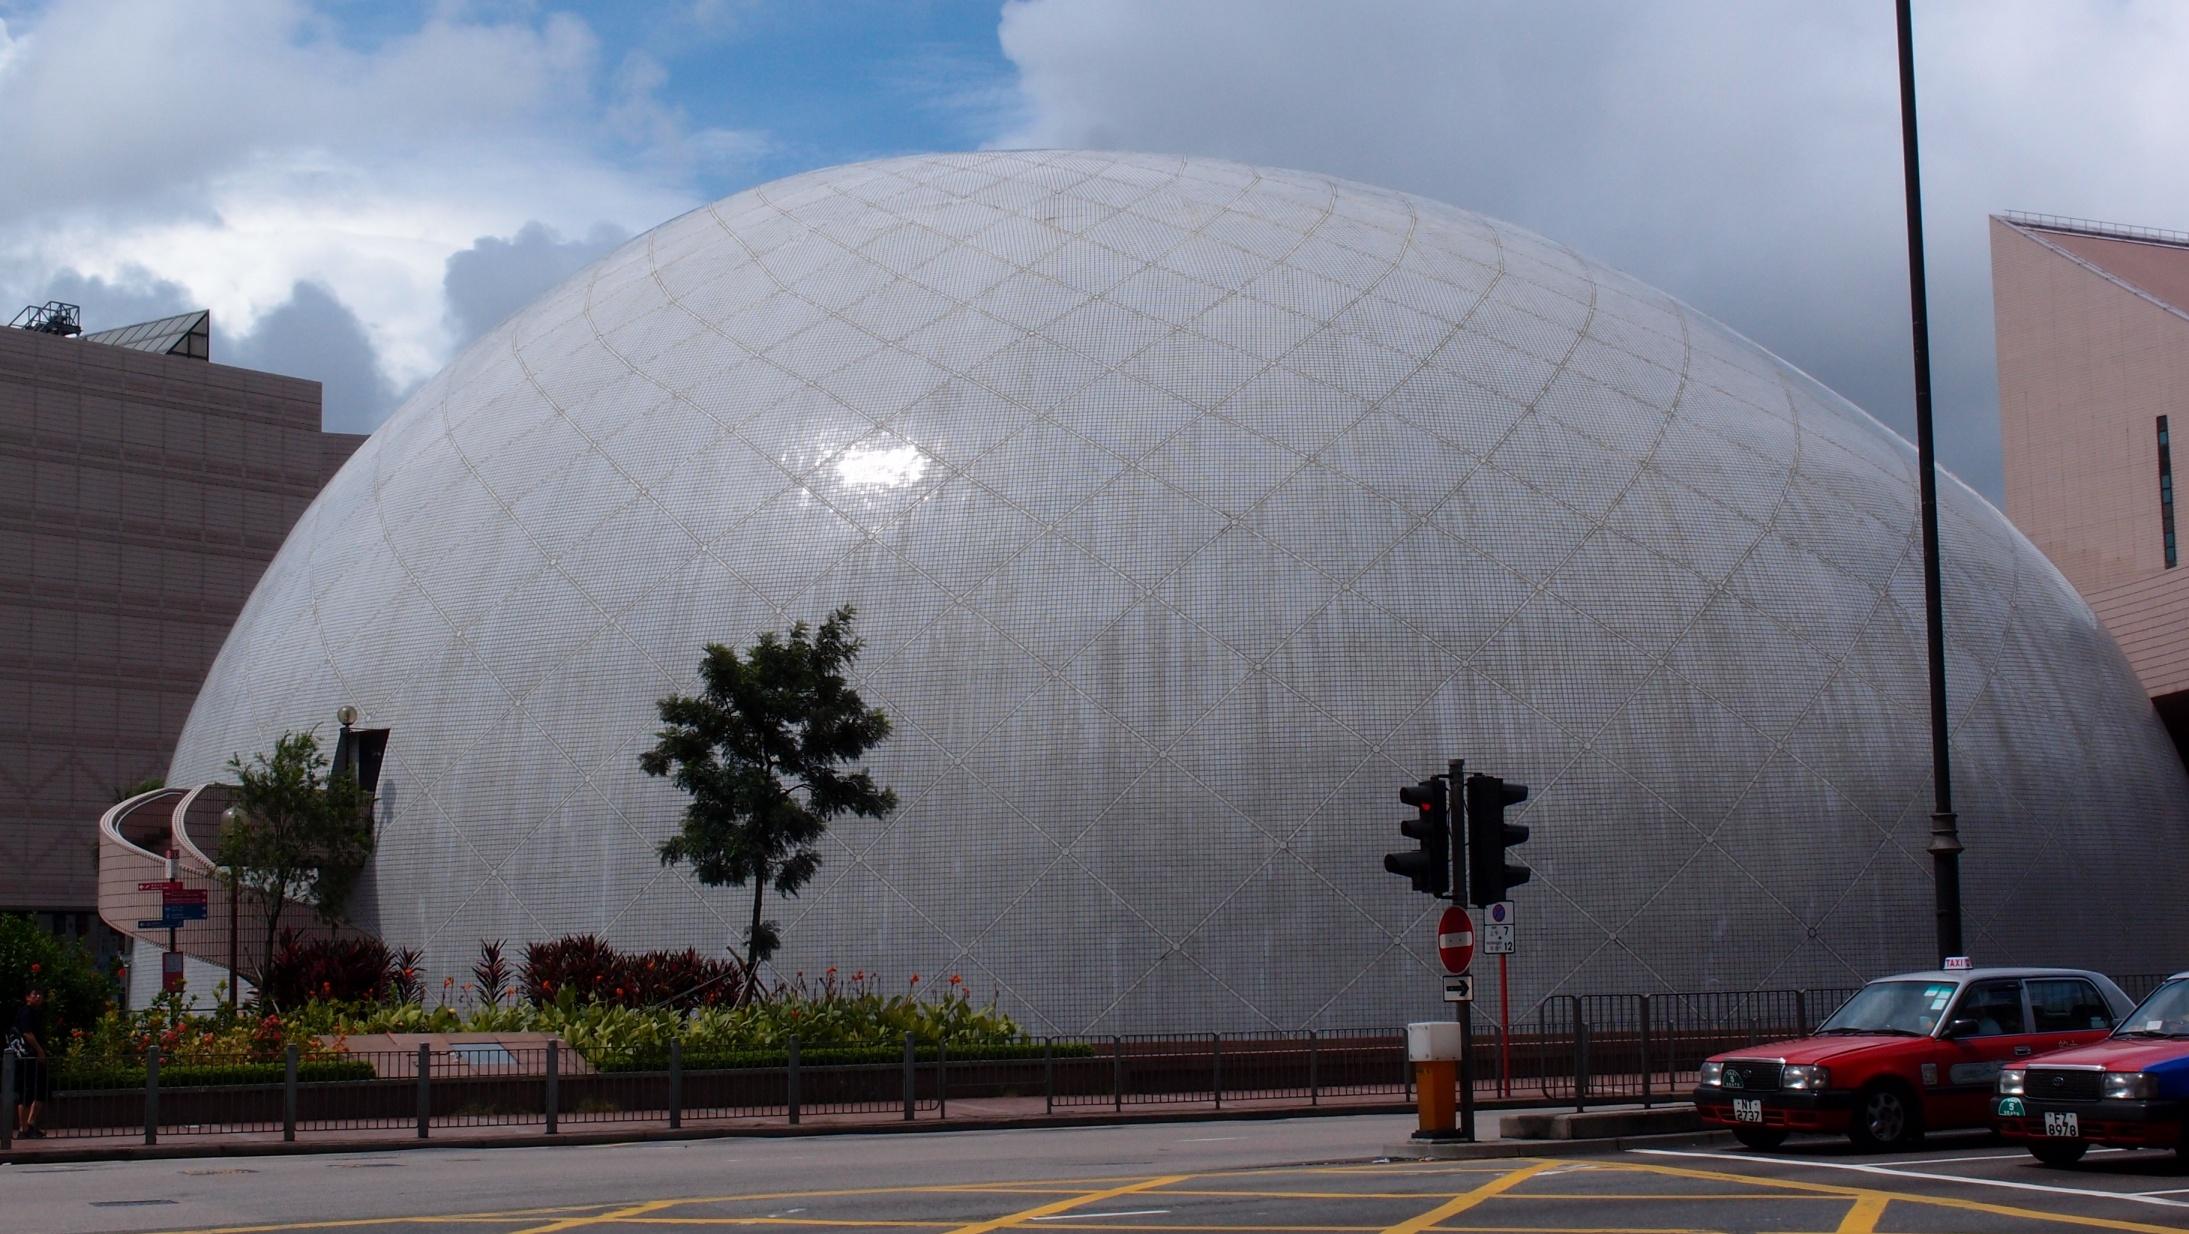 The Space Museum Hong Kong